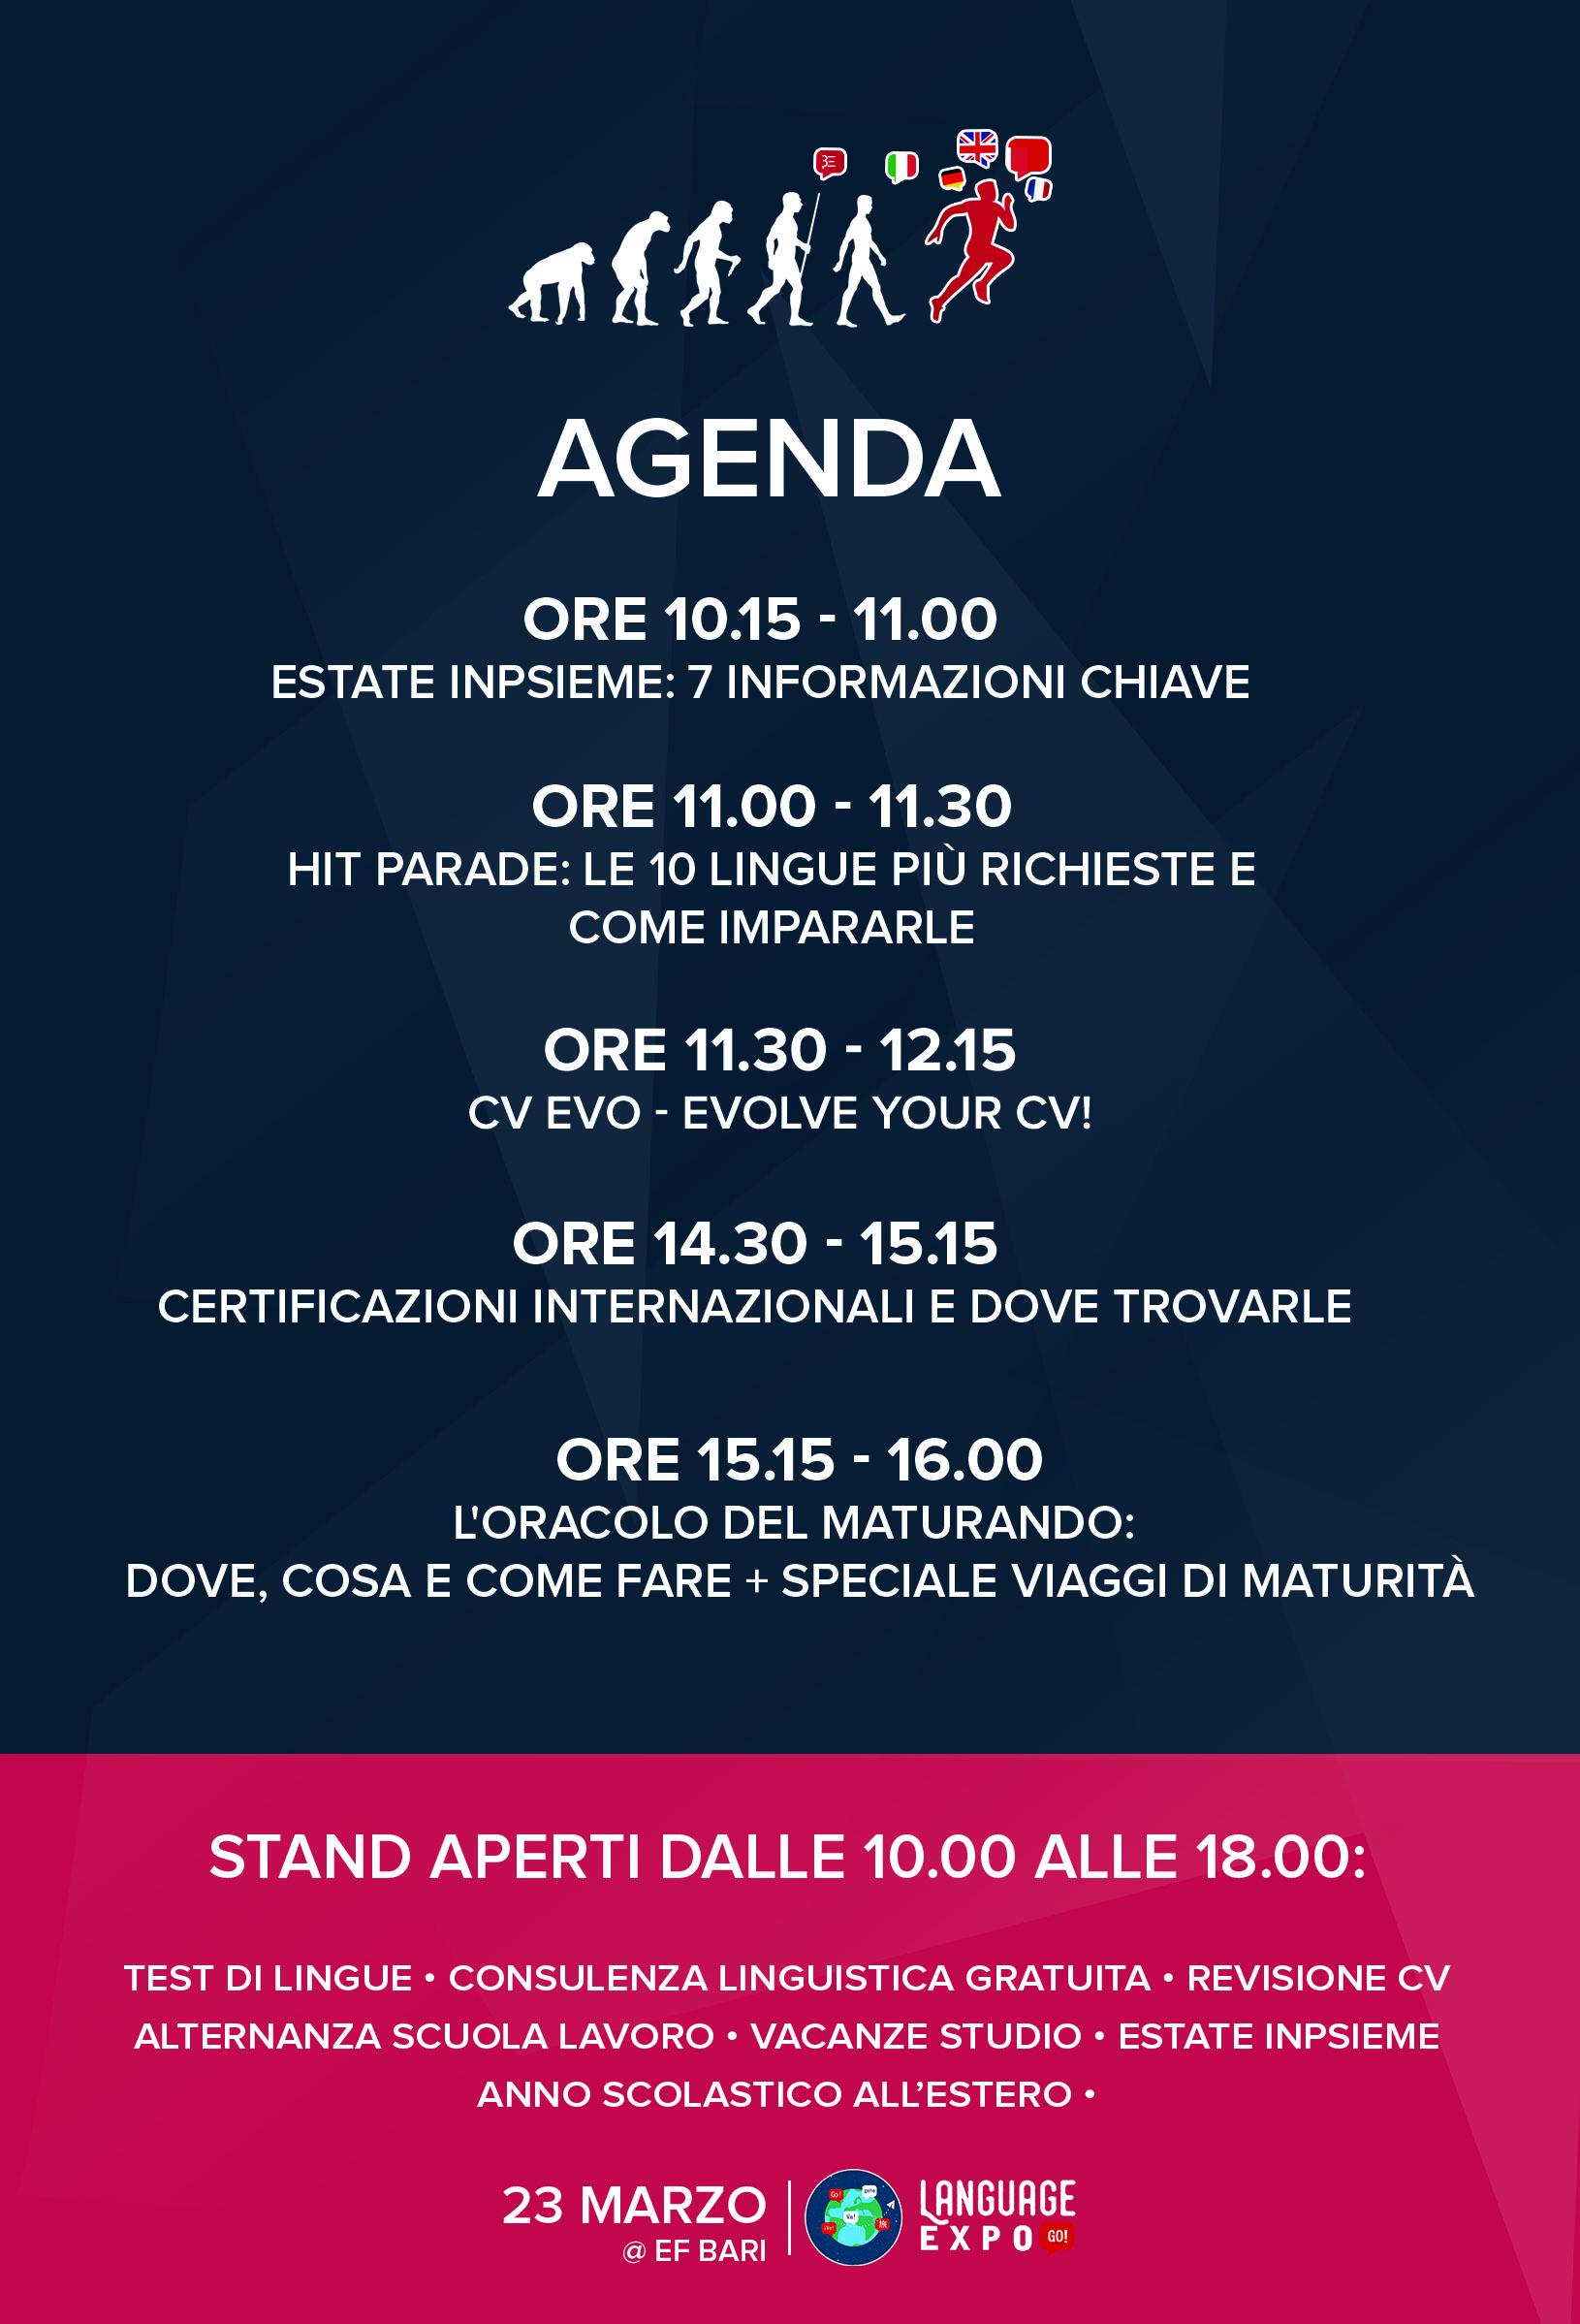 Agenda Bari